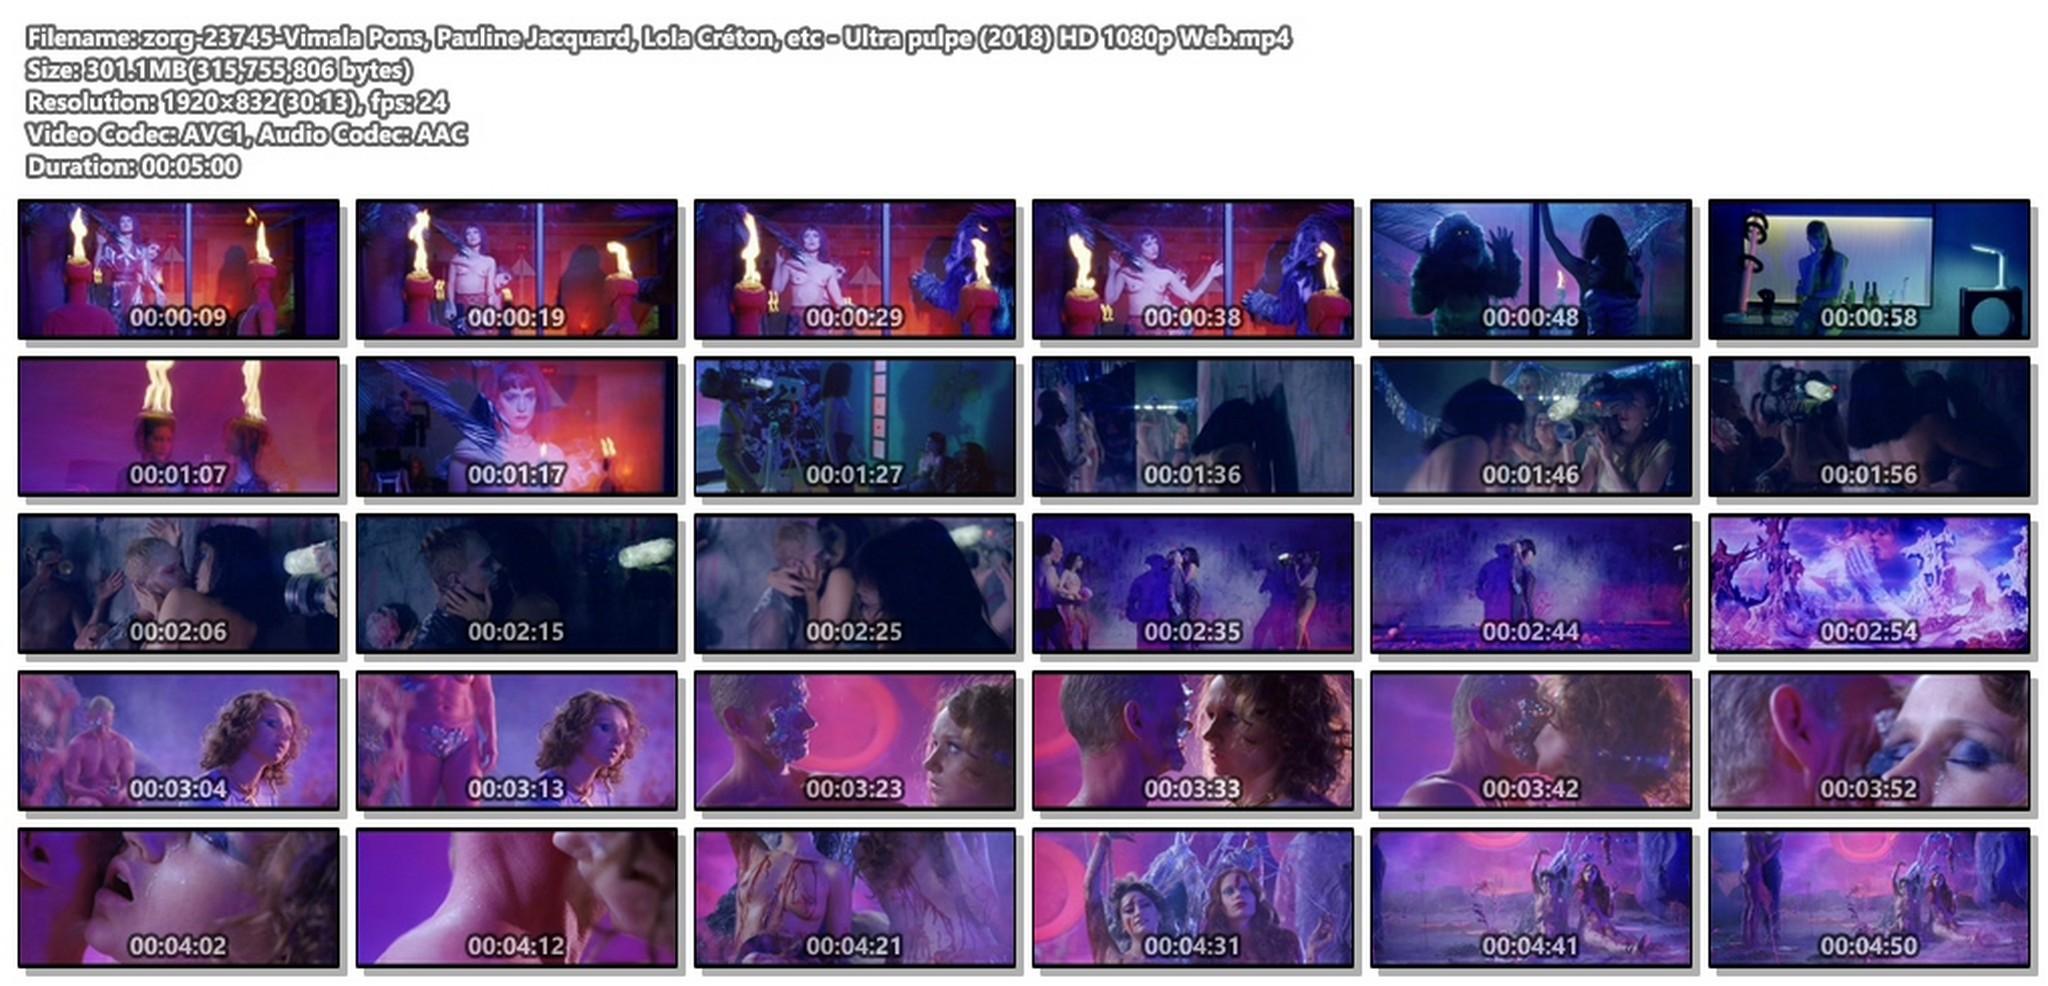 Vimala Pons nude Pauline Jacquard, Lola Créton asnd other nude too - Ultra pulpe (2018) HD 1080p Web (1)